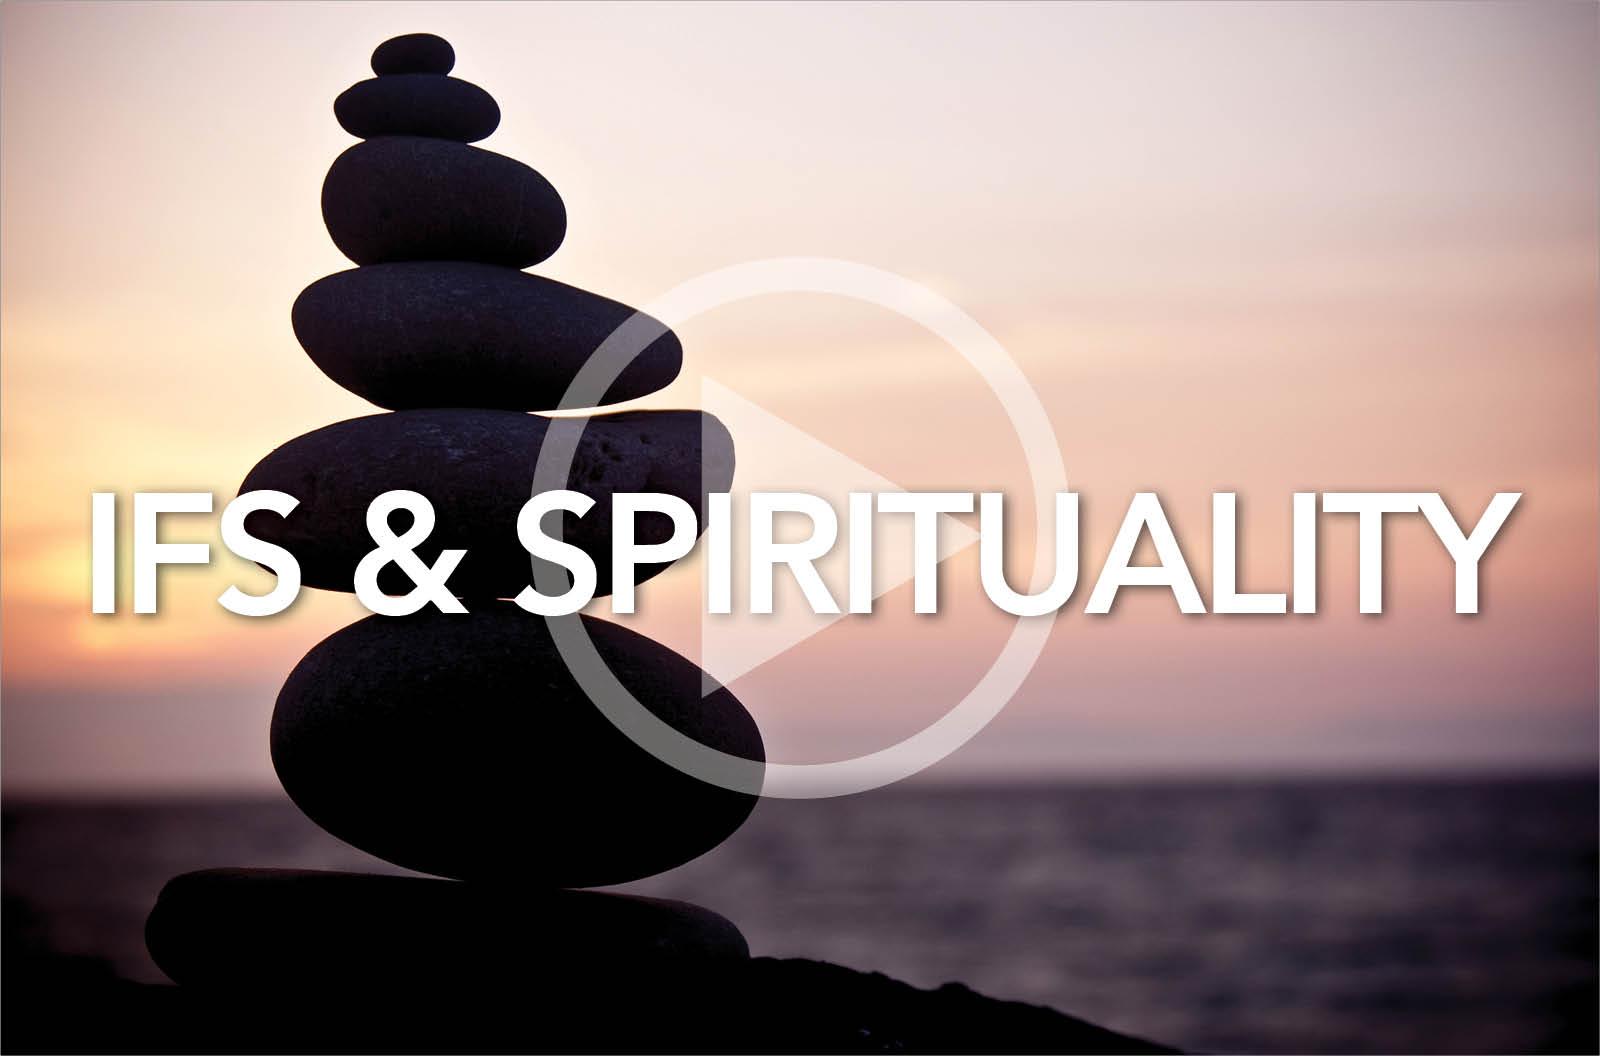 IFS and Spirituality